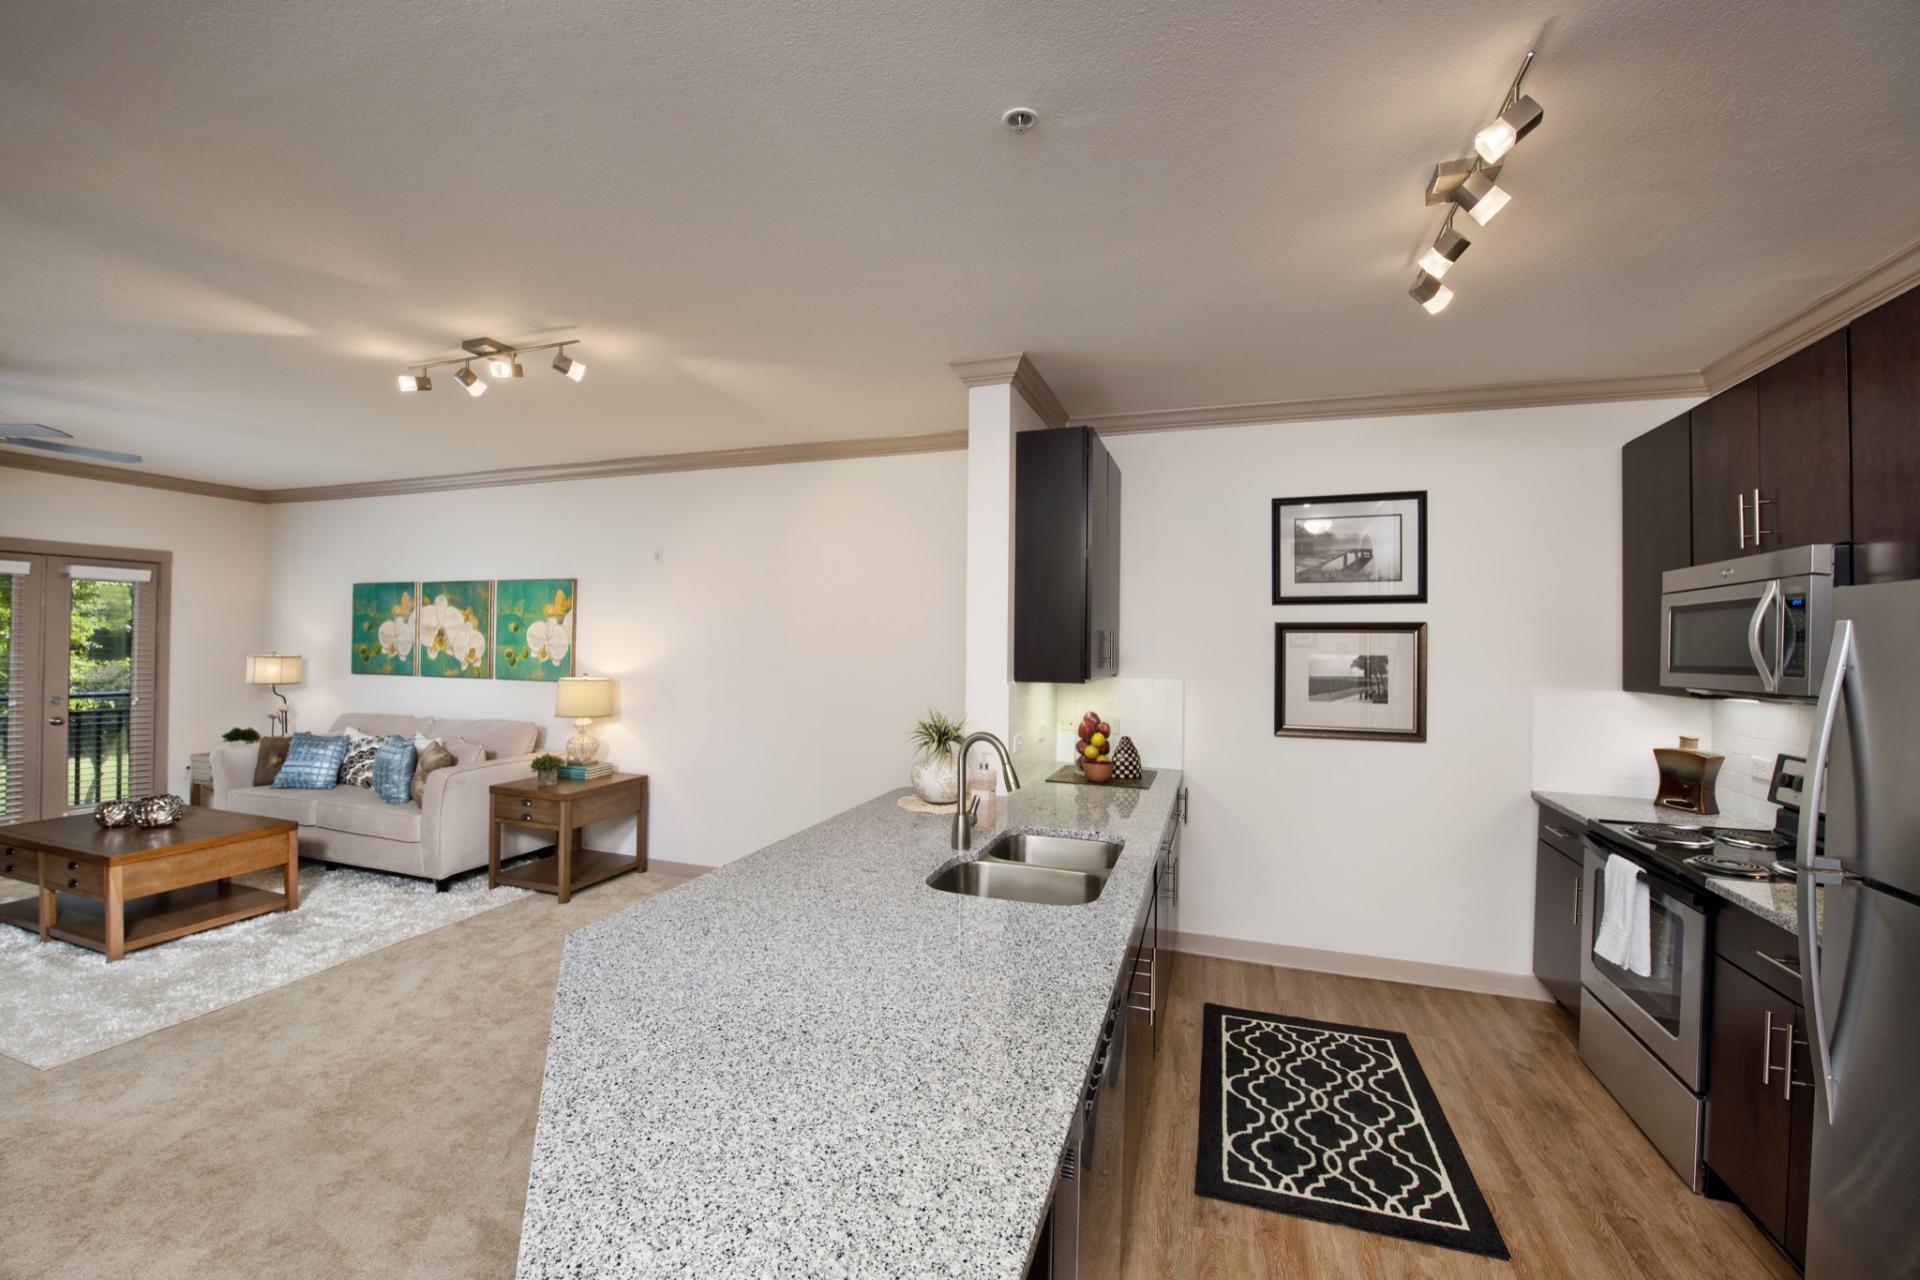 Camden Midtown Atlanta Apartments image 2